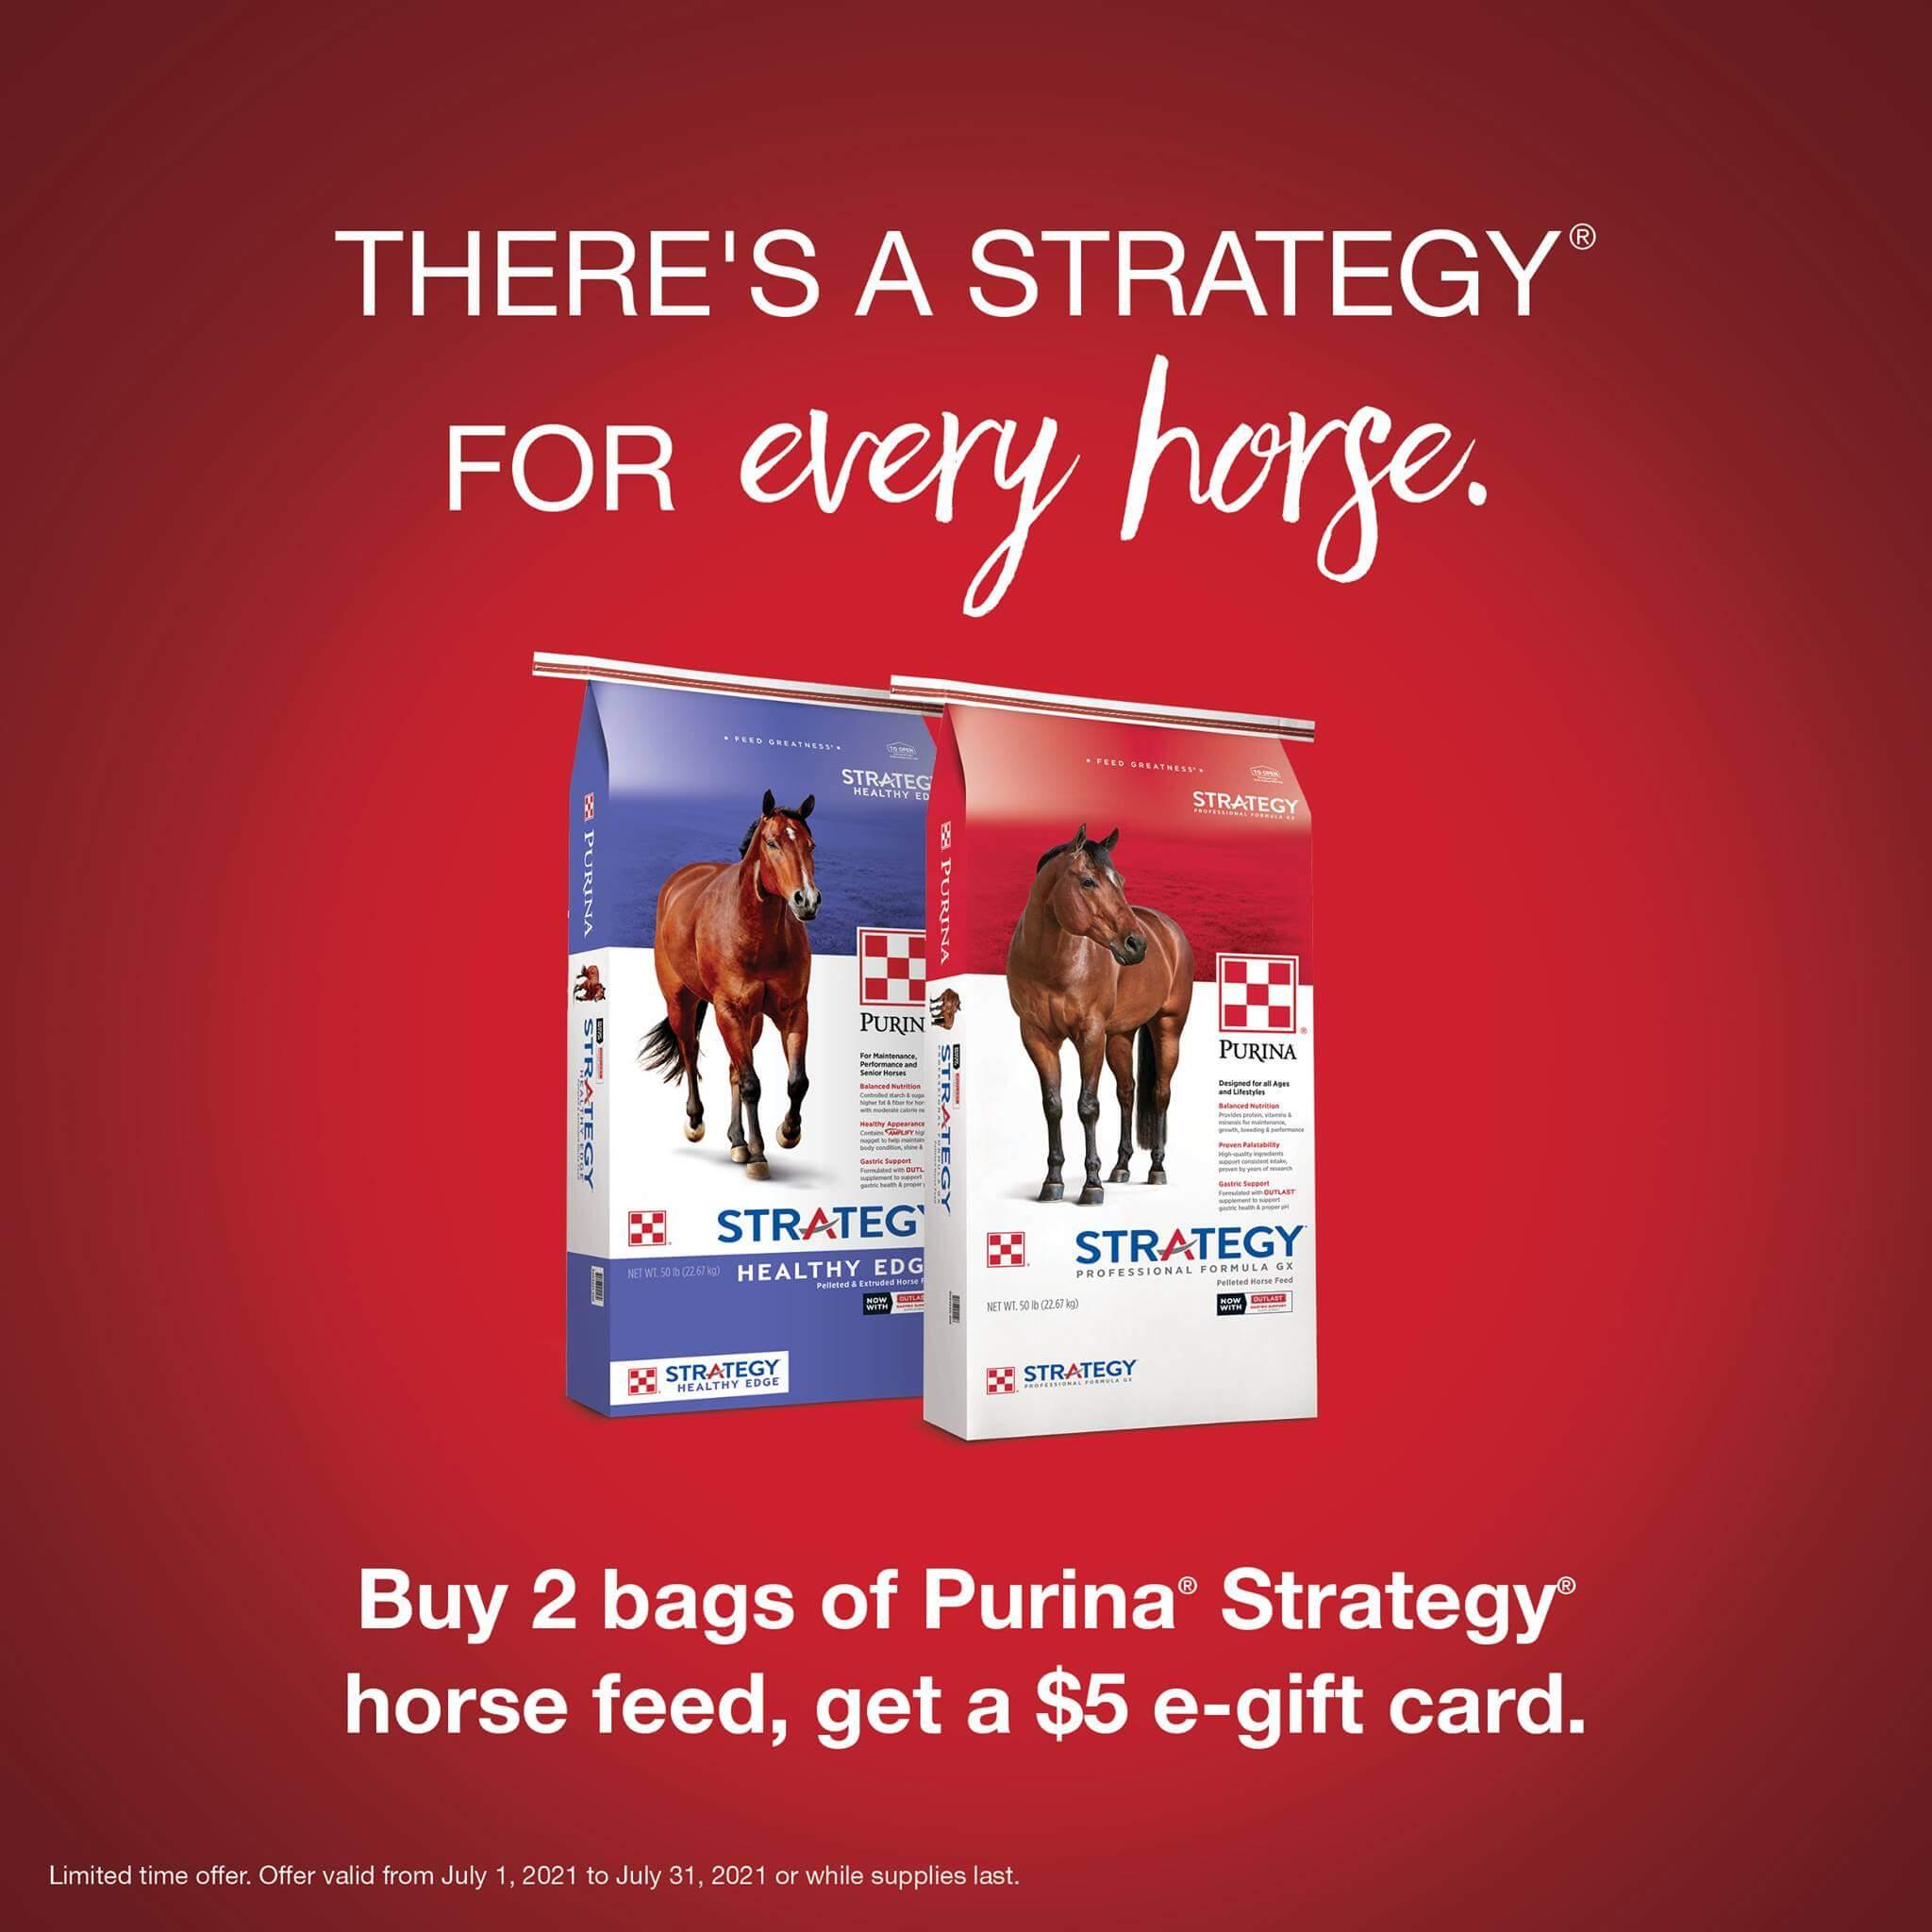 purina horse feed strategy feed greatness healthy edge